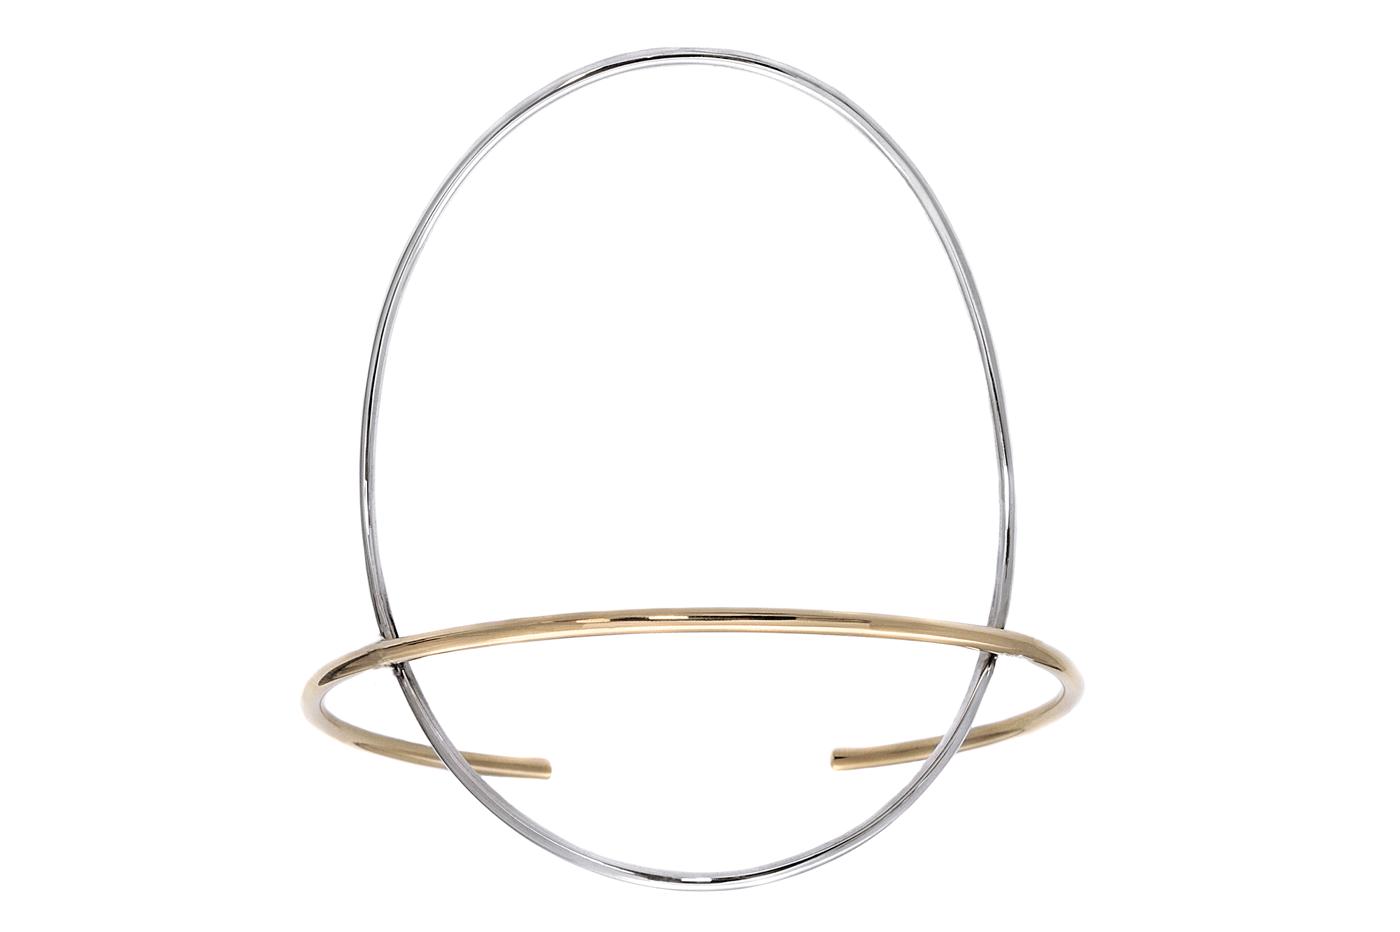 Adeline Cacheux Jewelry Design jonc argent or 18 carats